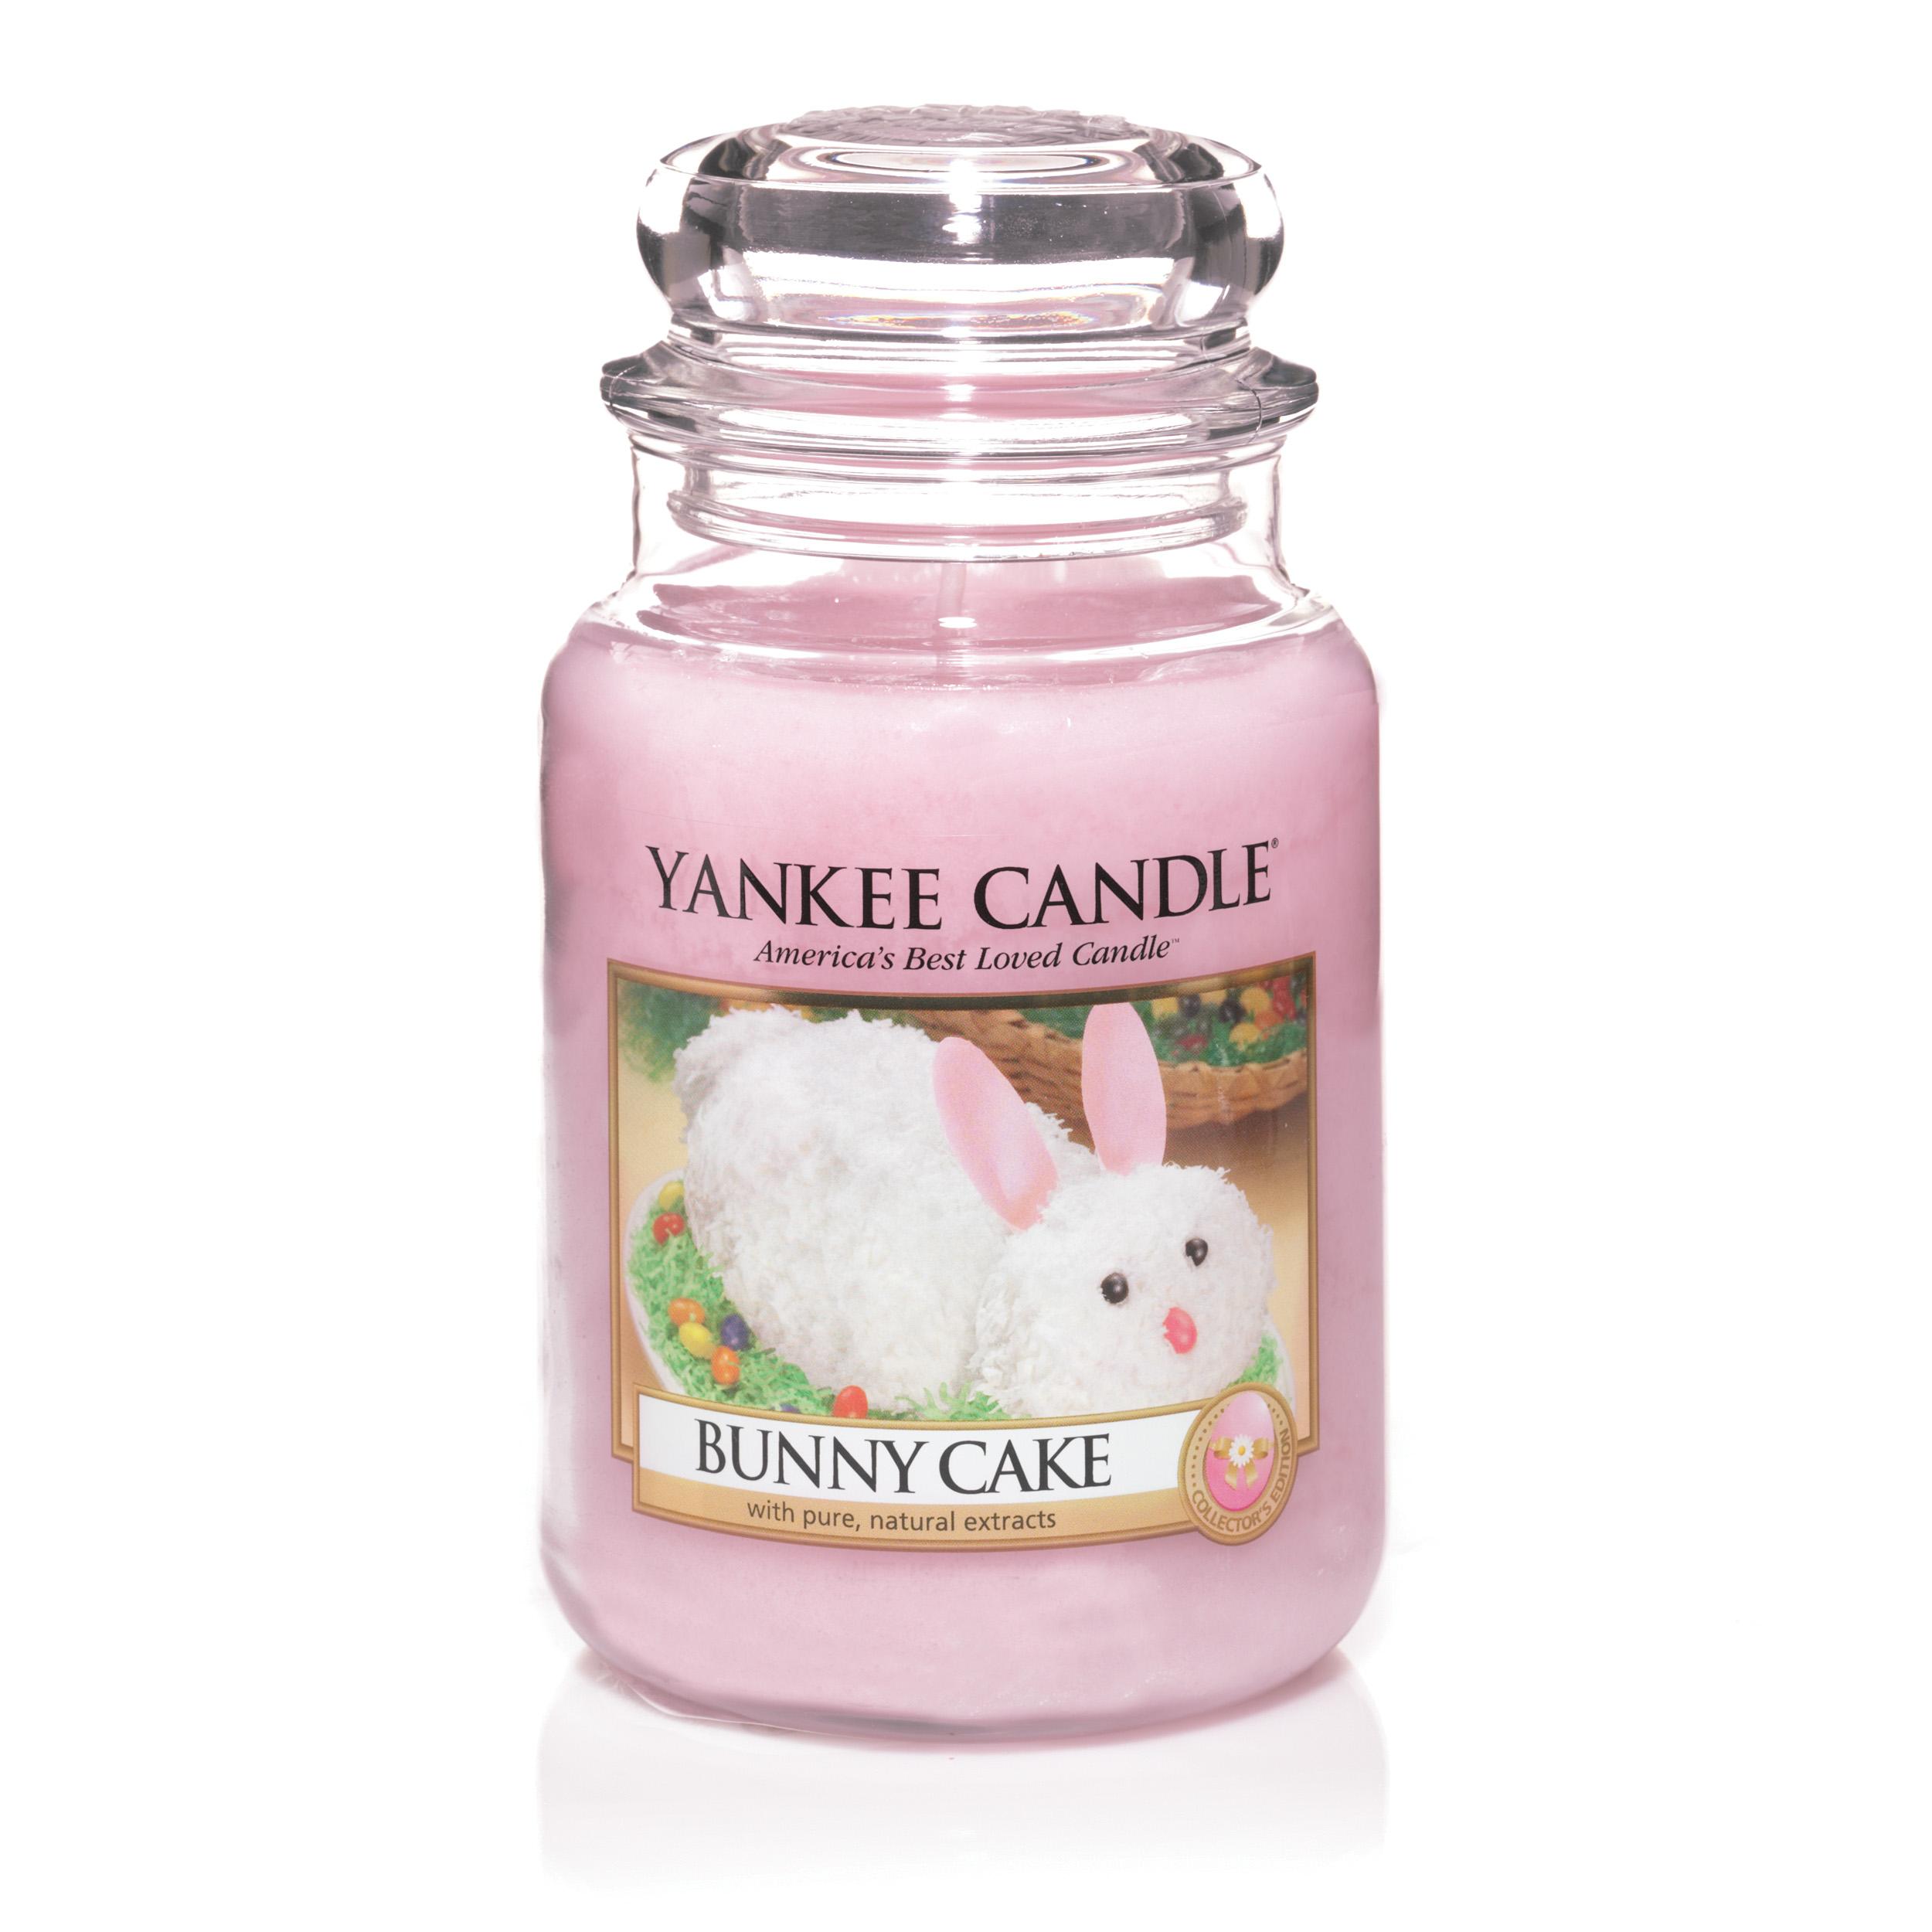 Yankee Bunny Cake candle